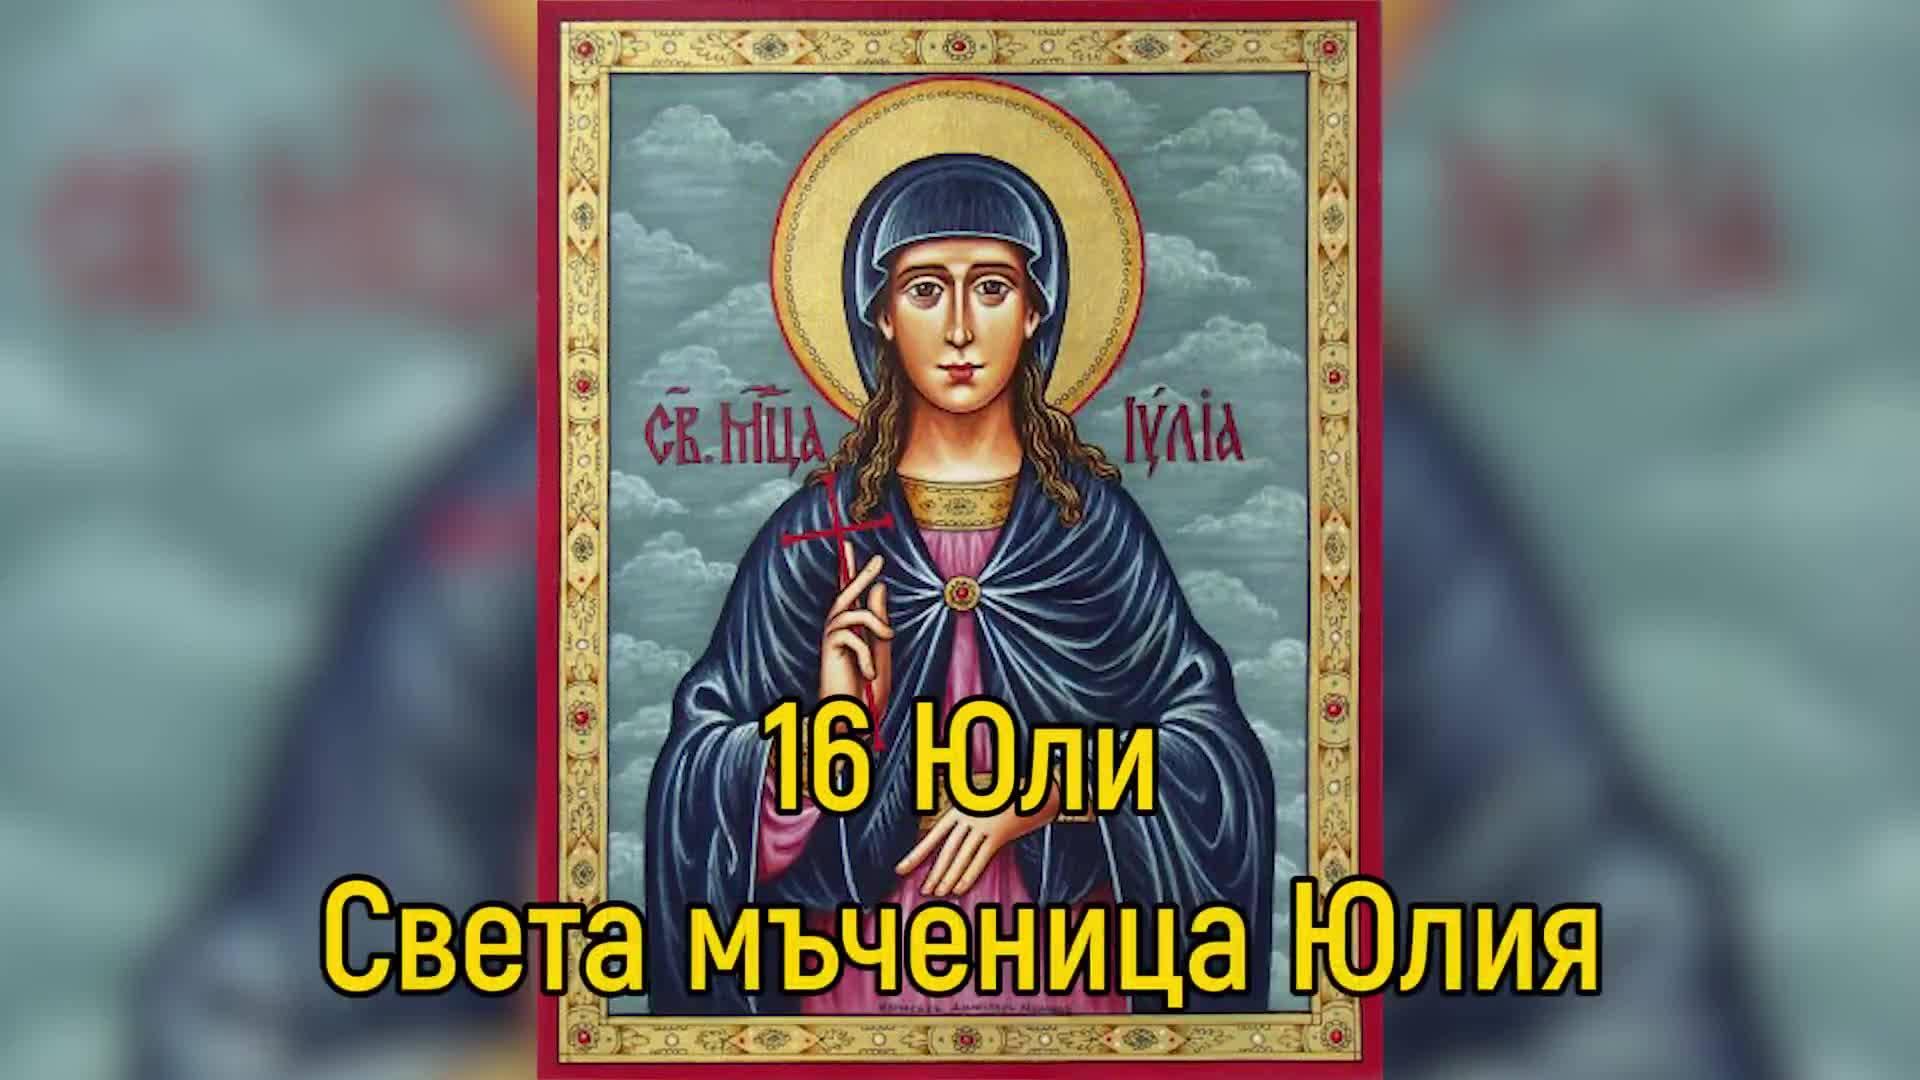 16 Юли - Света мъченица Юлия